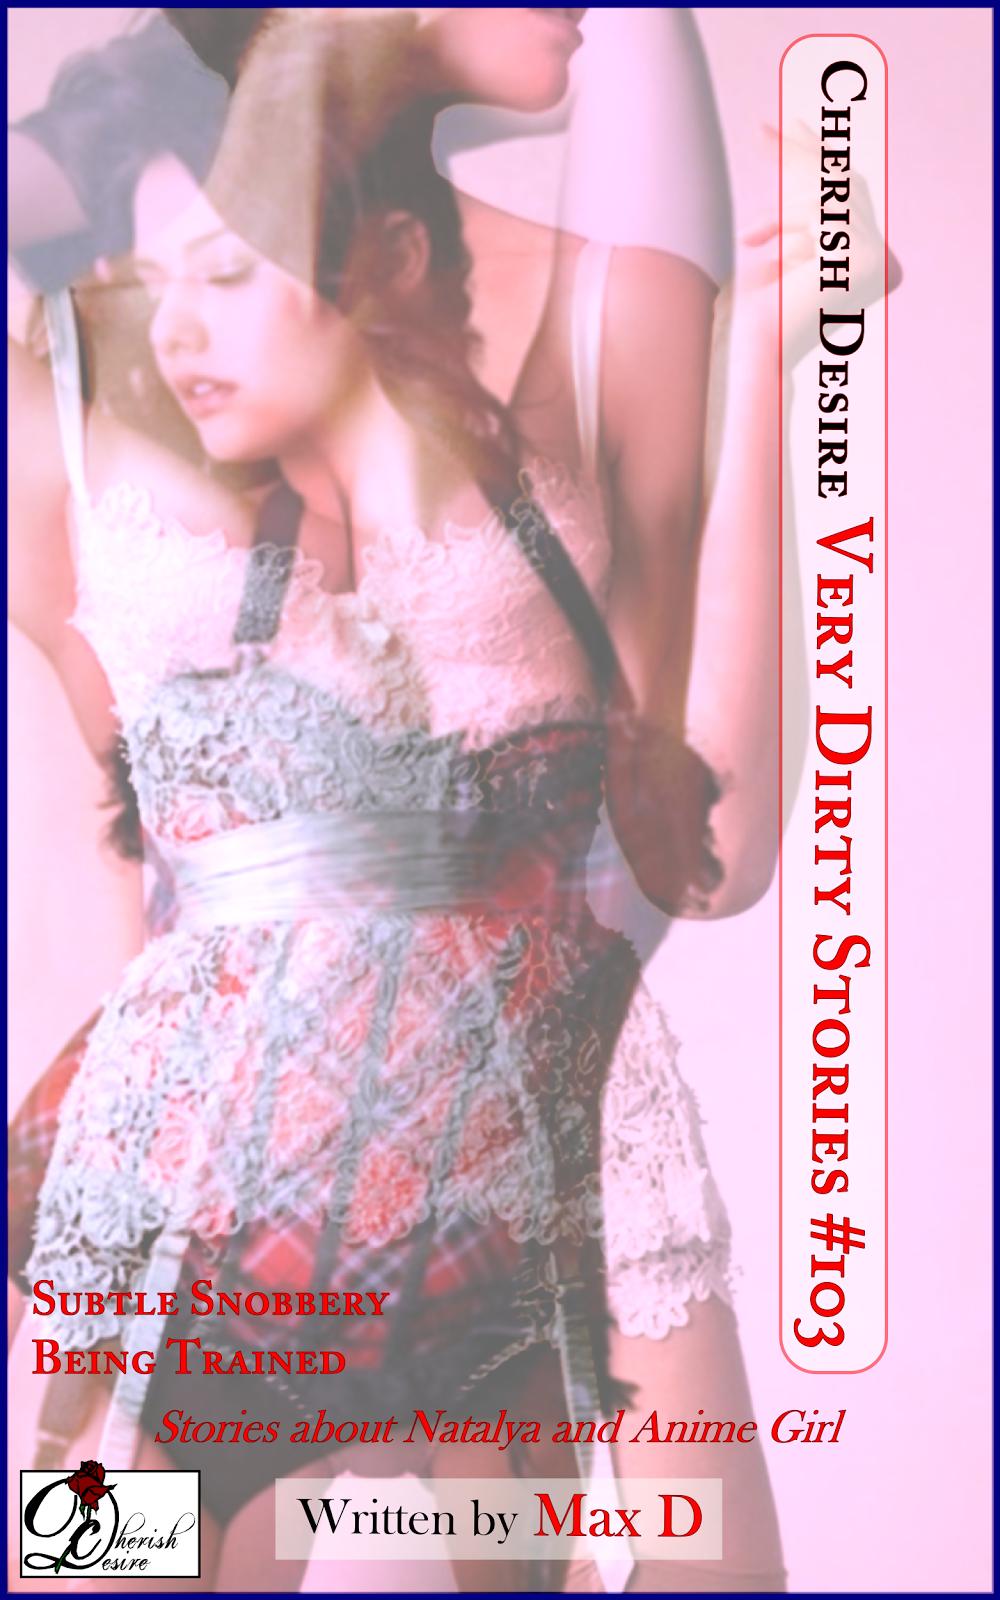 Cherish Desire: Very Dirty Stories #103, Max D, erotica